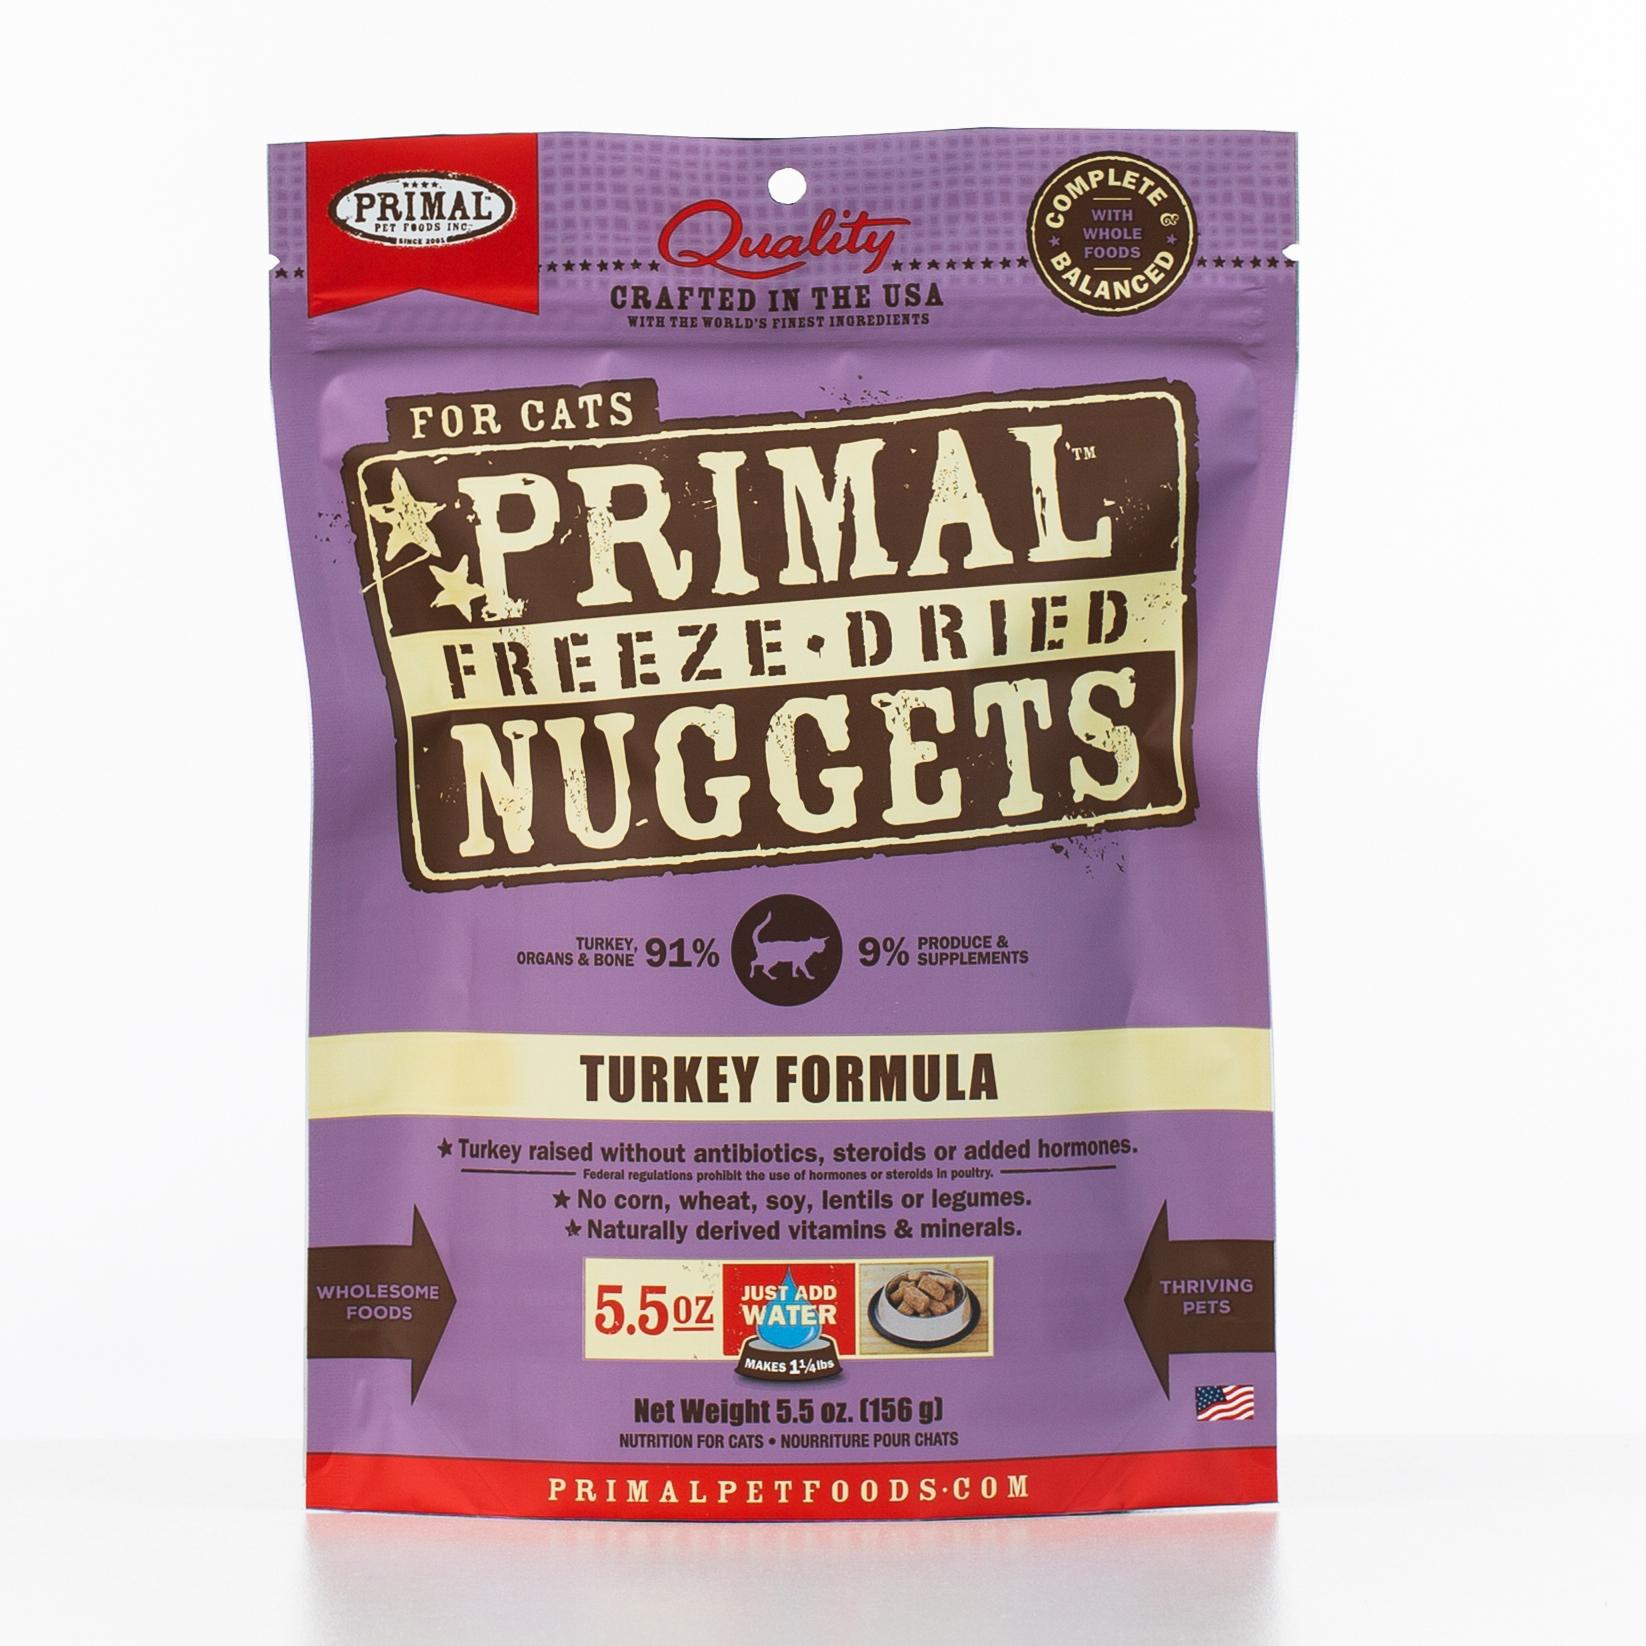 Primal Raw Freeze-Dried Nuggets Turkey Formula Cat Food Image